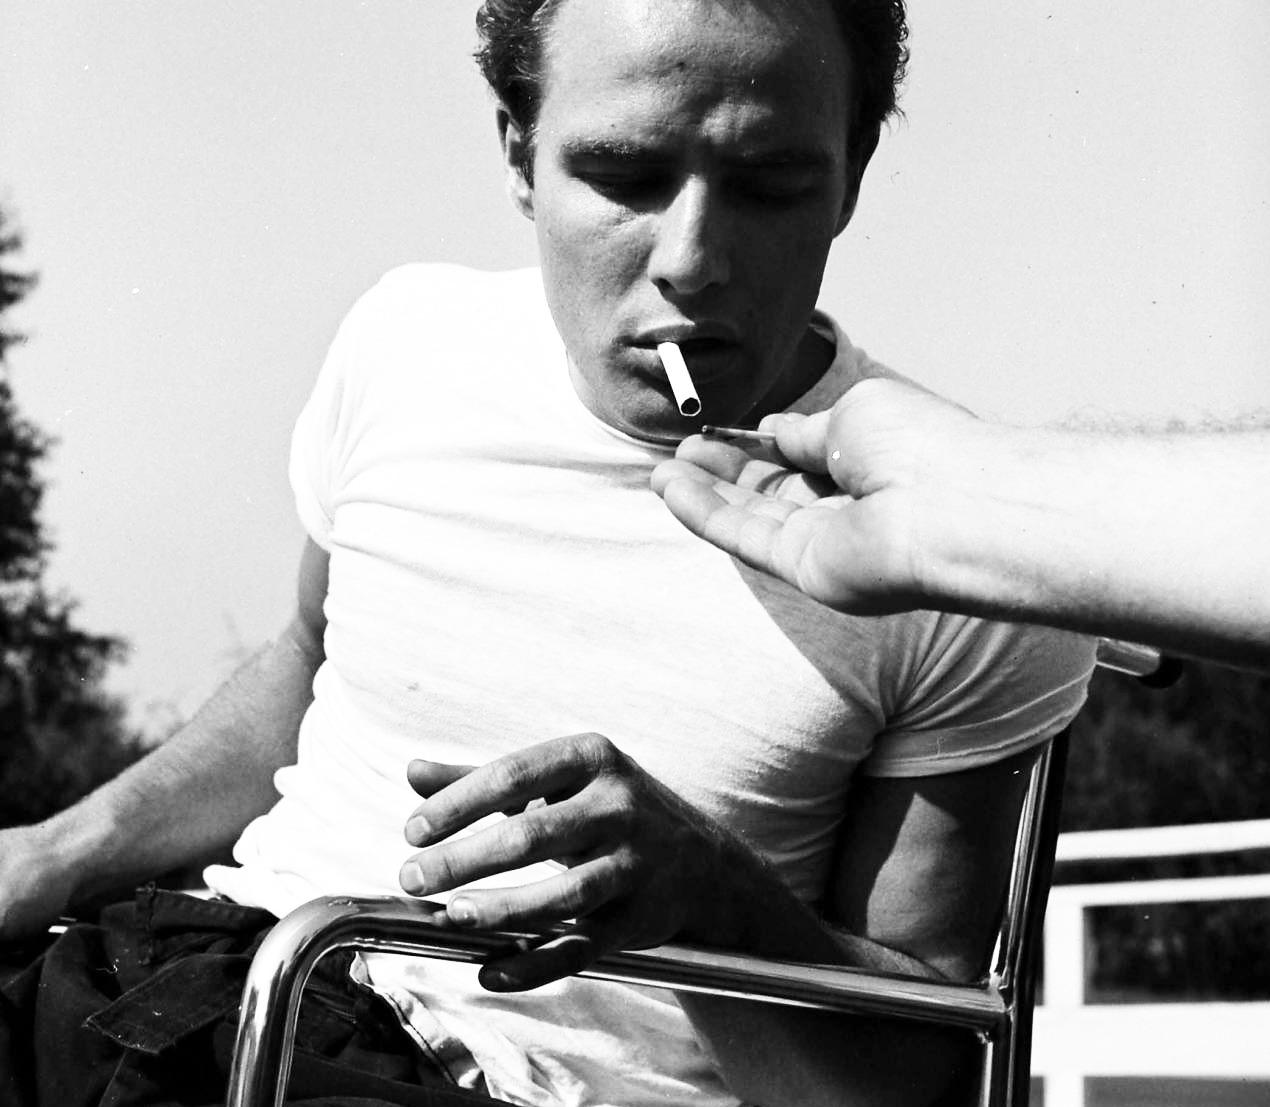 Brando's Penis Had Its Own Agenda